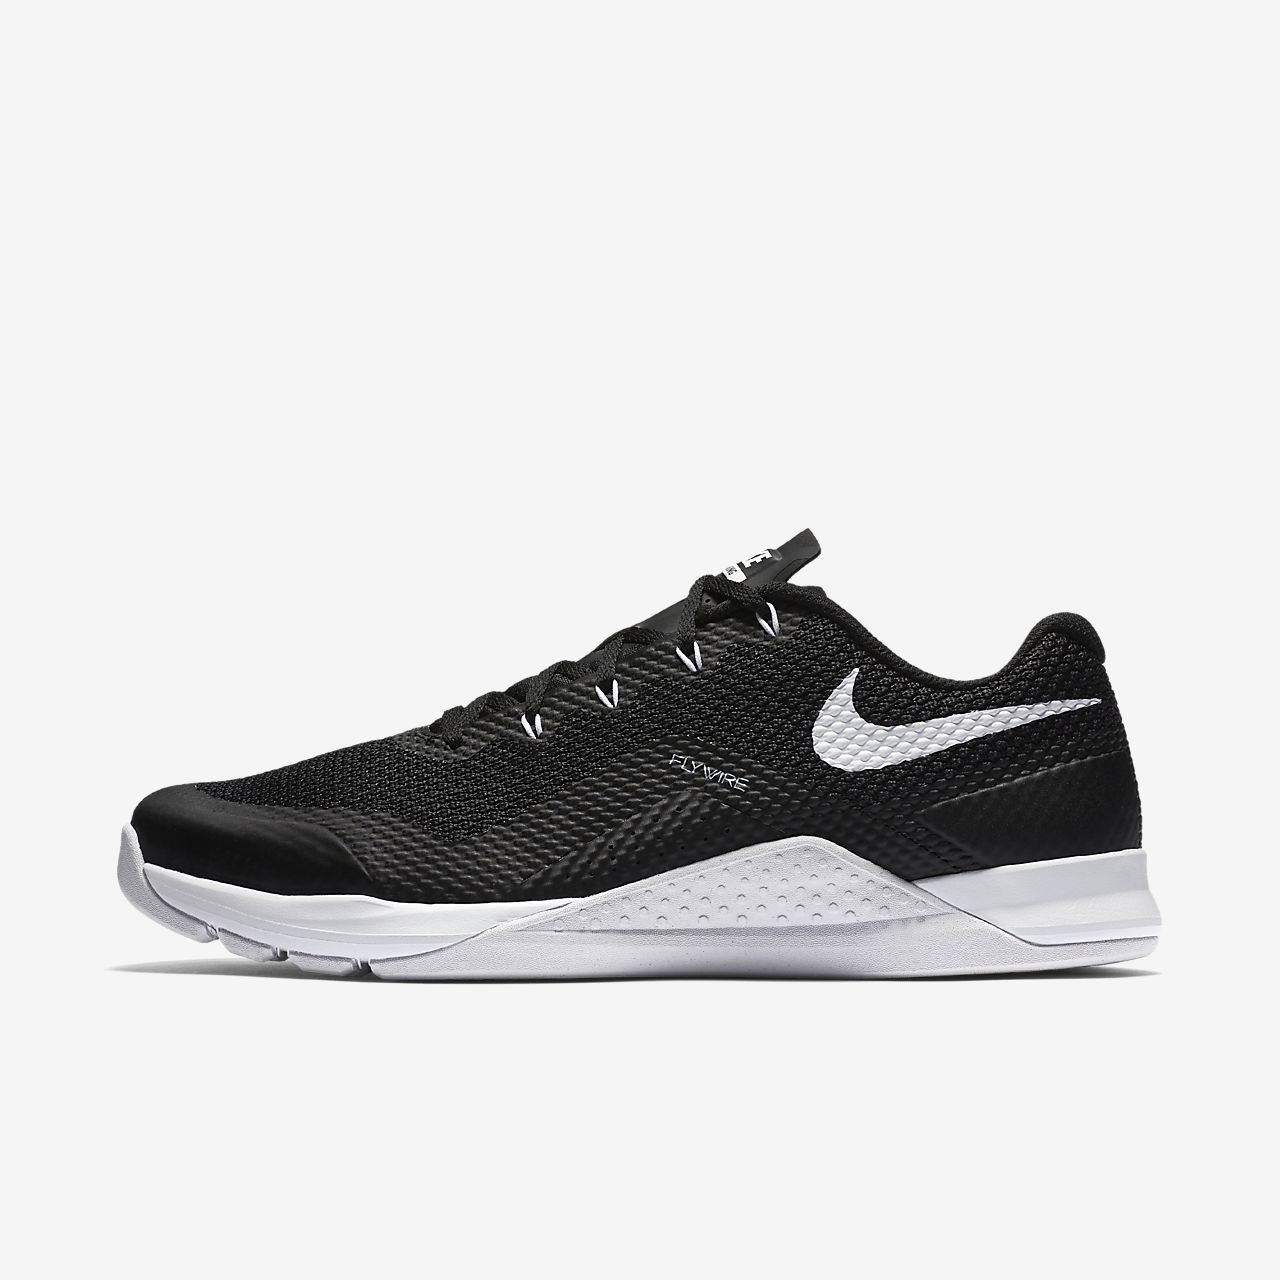 Nike Metcon Repper Dsx Men S Training Shoe Mens Nike Golf Shoes Adidas Golf Shoes Nike Golf Shoes